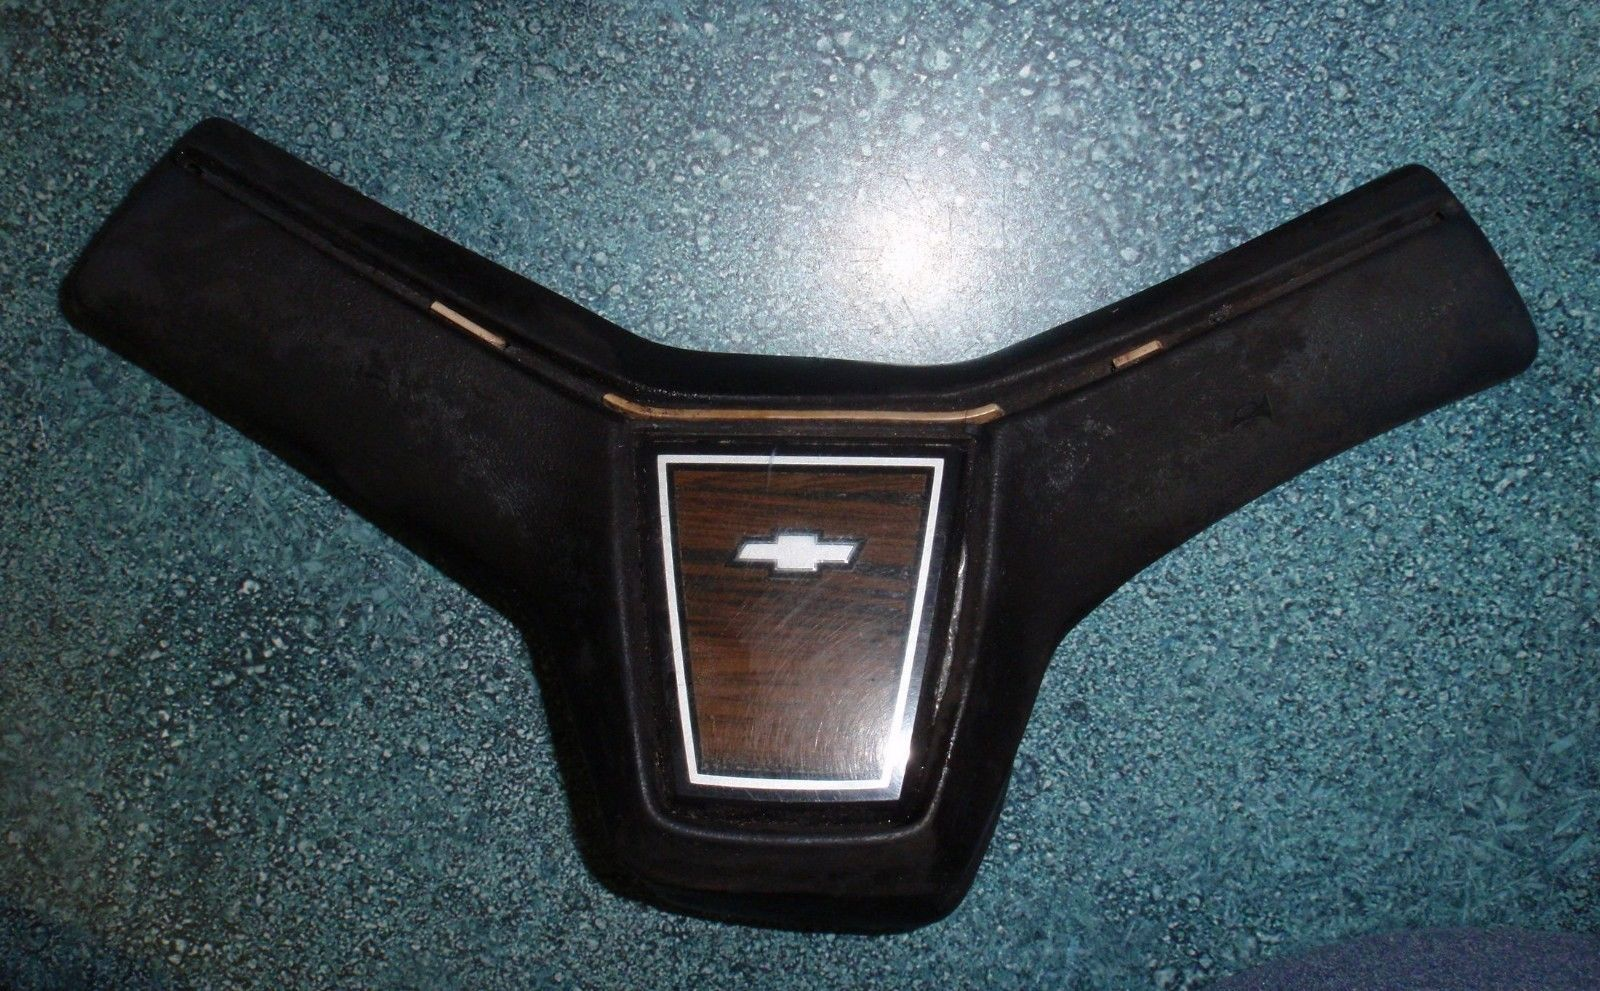 VINTAGE Steering Wheel GM Chevy Malibu 9761093-2-7 1970s?